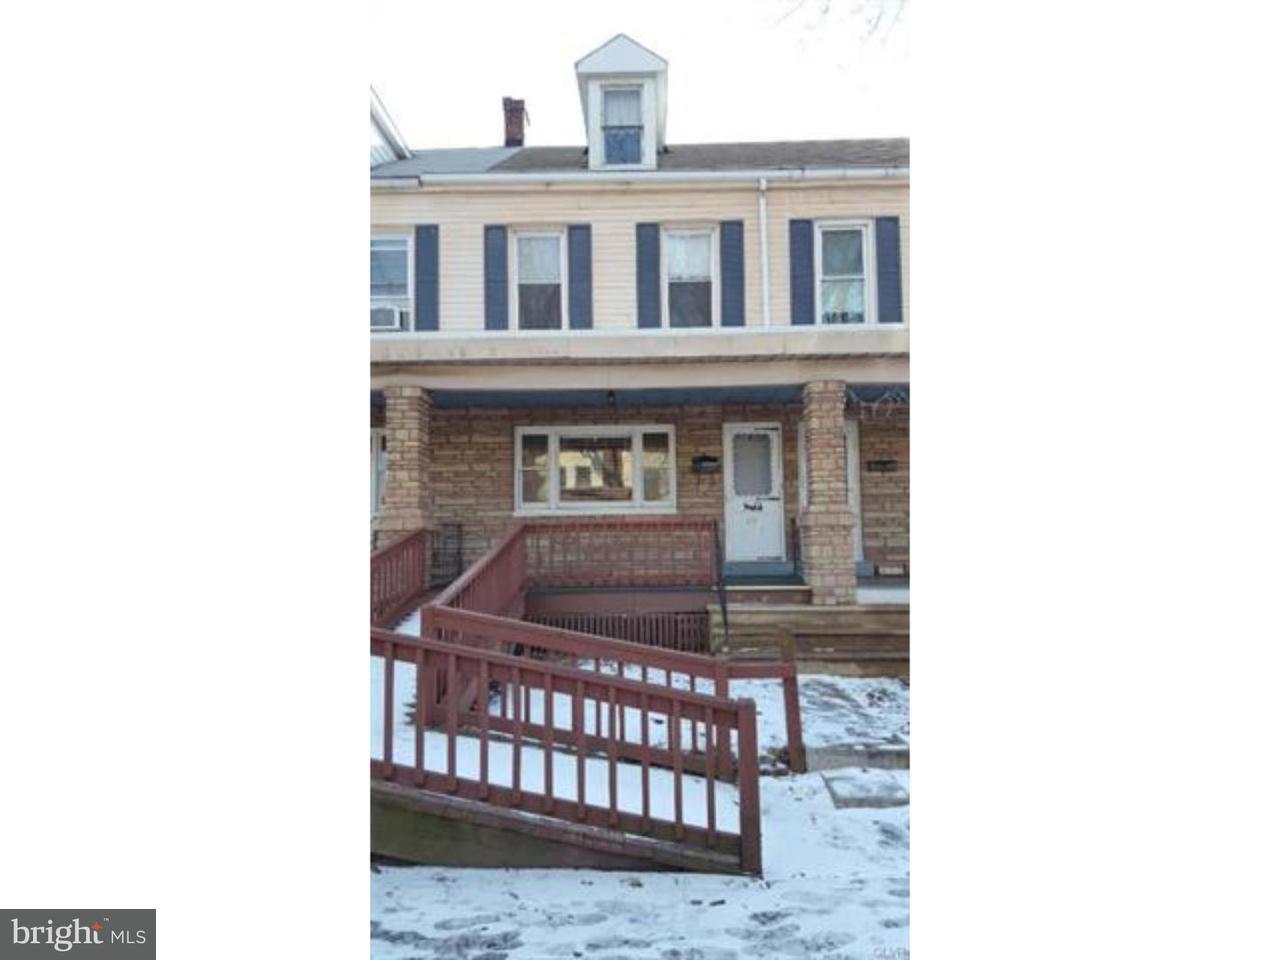 Townhouse for Sale at 472 1/2 LEHIGH Avenue Palmerton, Pennsylvania 18071 United States